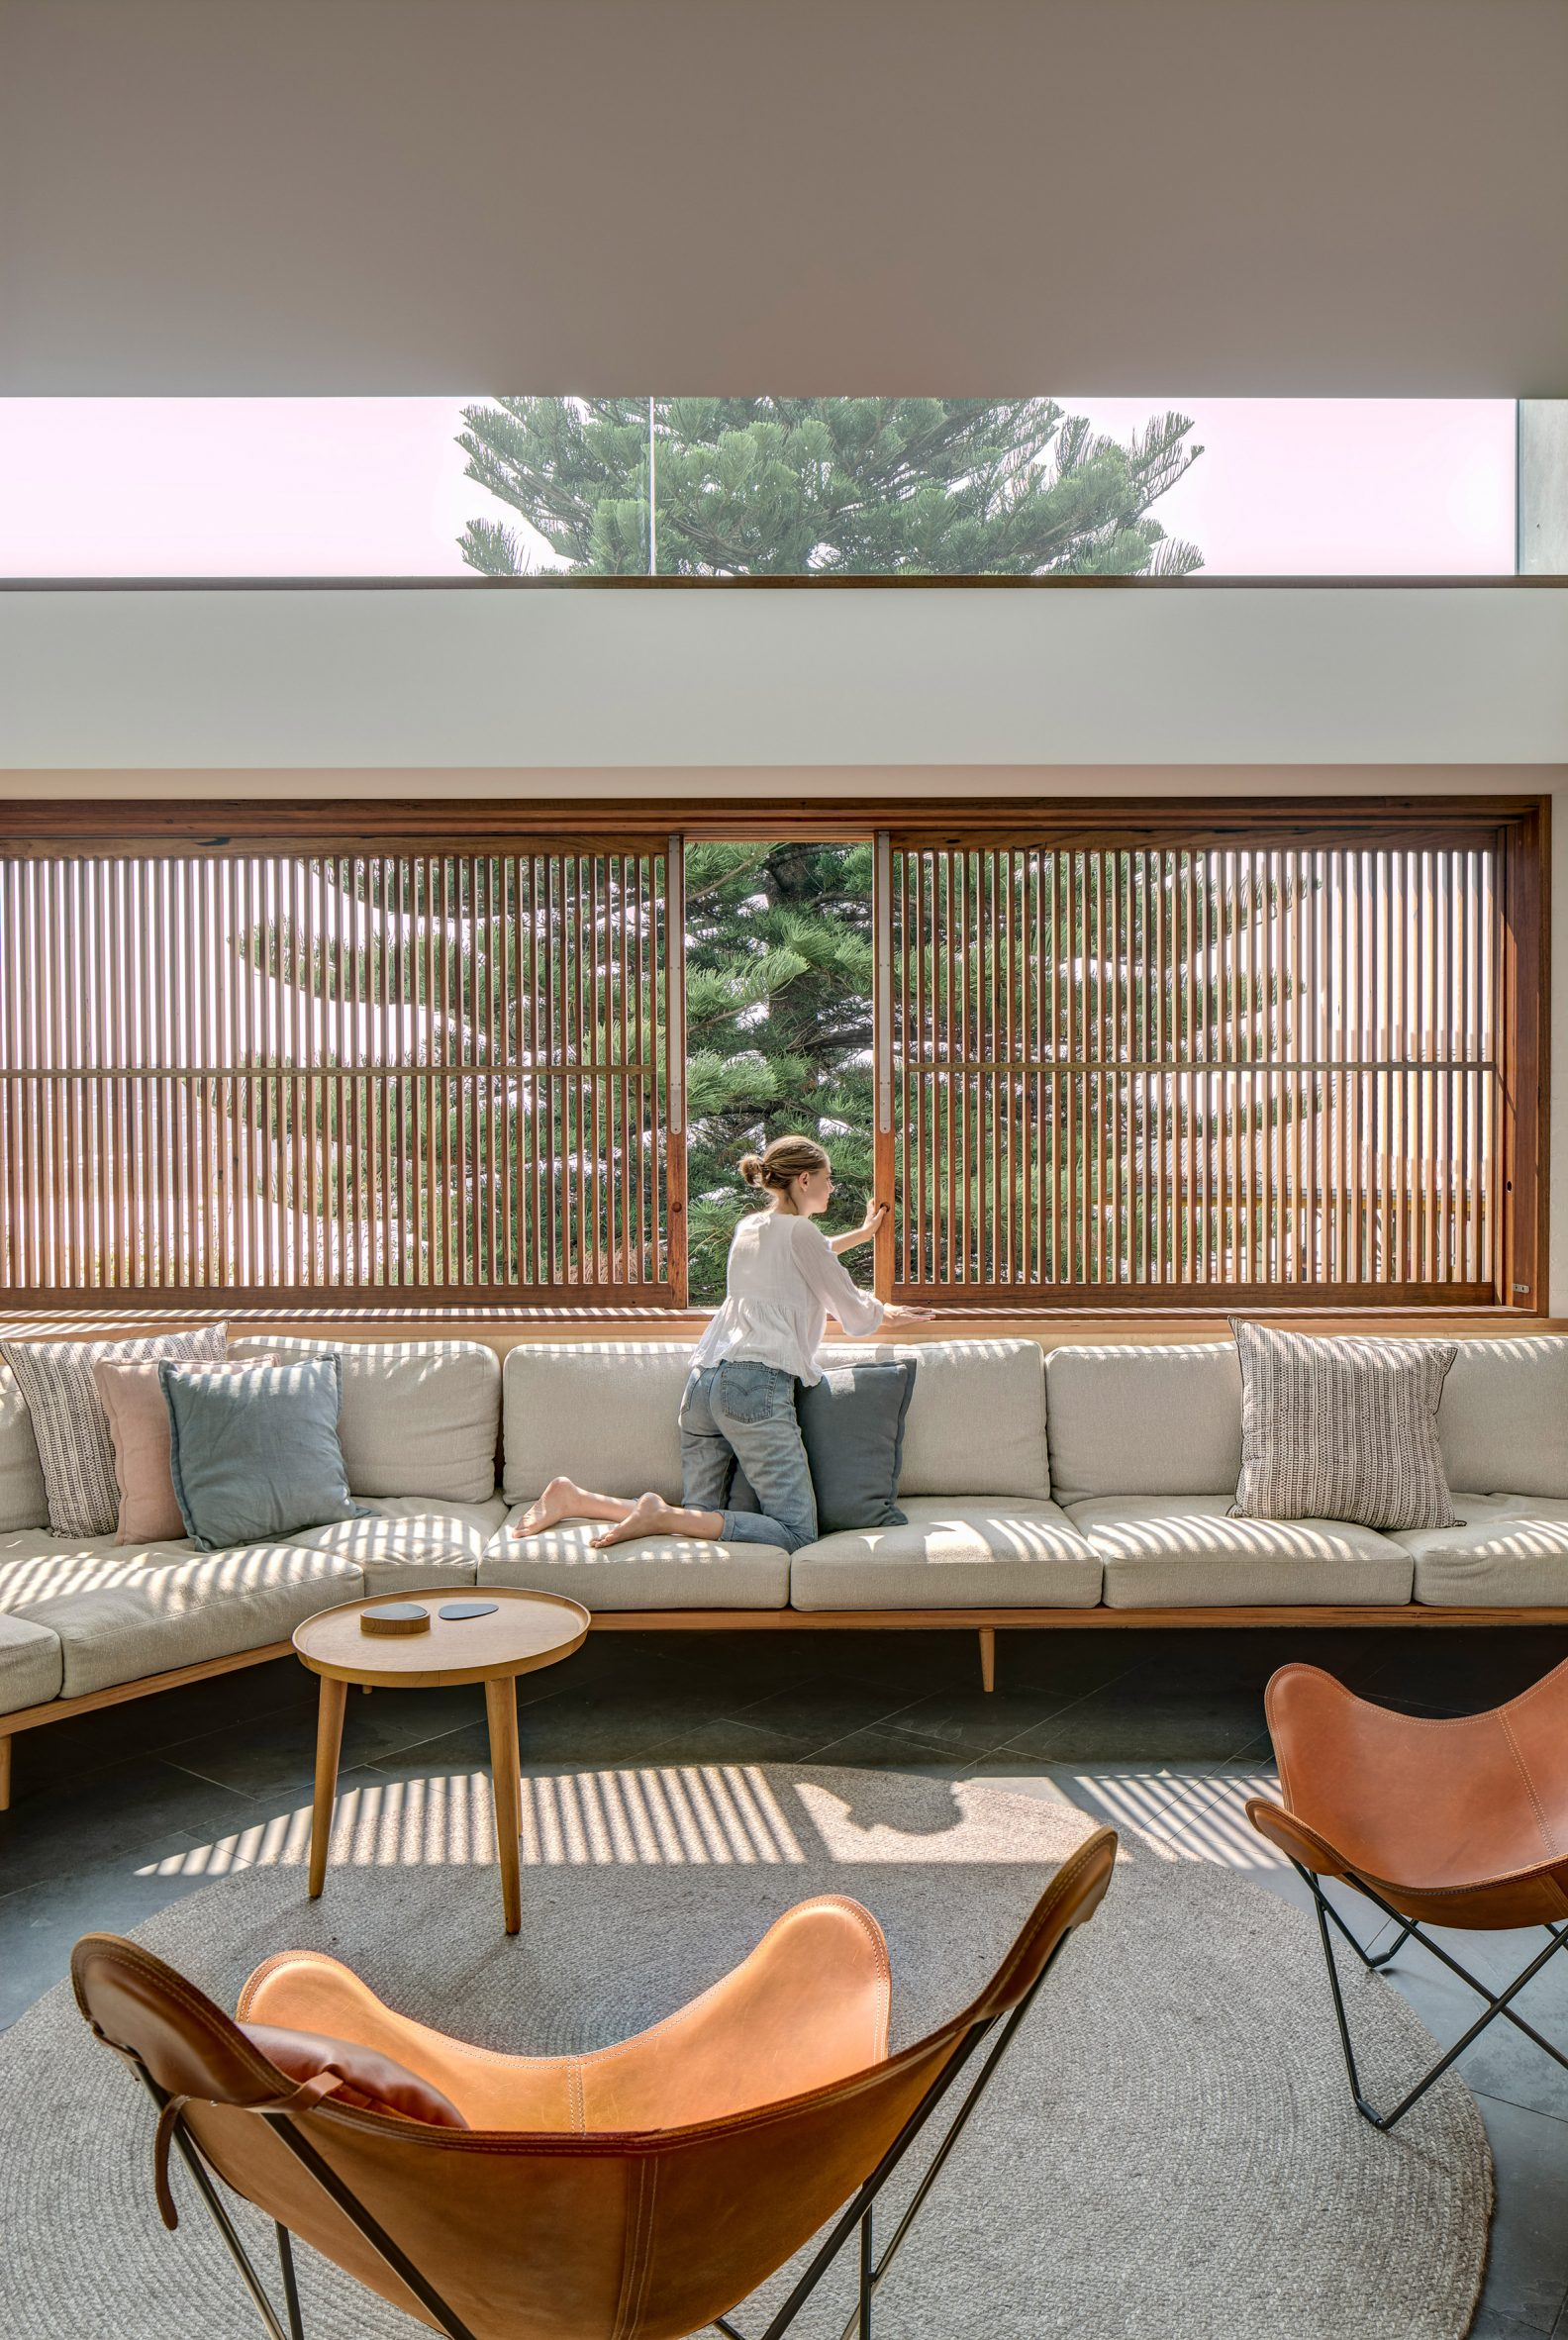 Slatted shutters line the living room windows in this Australian house